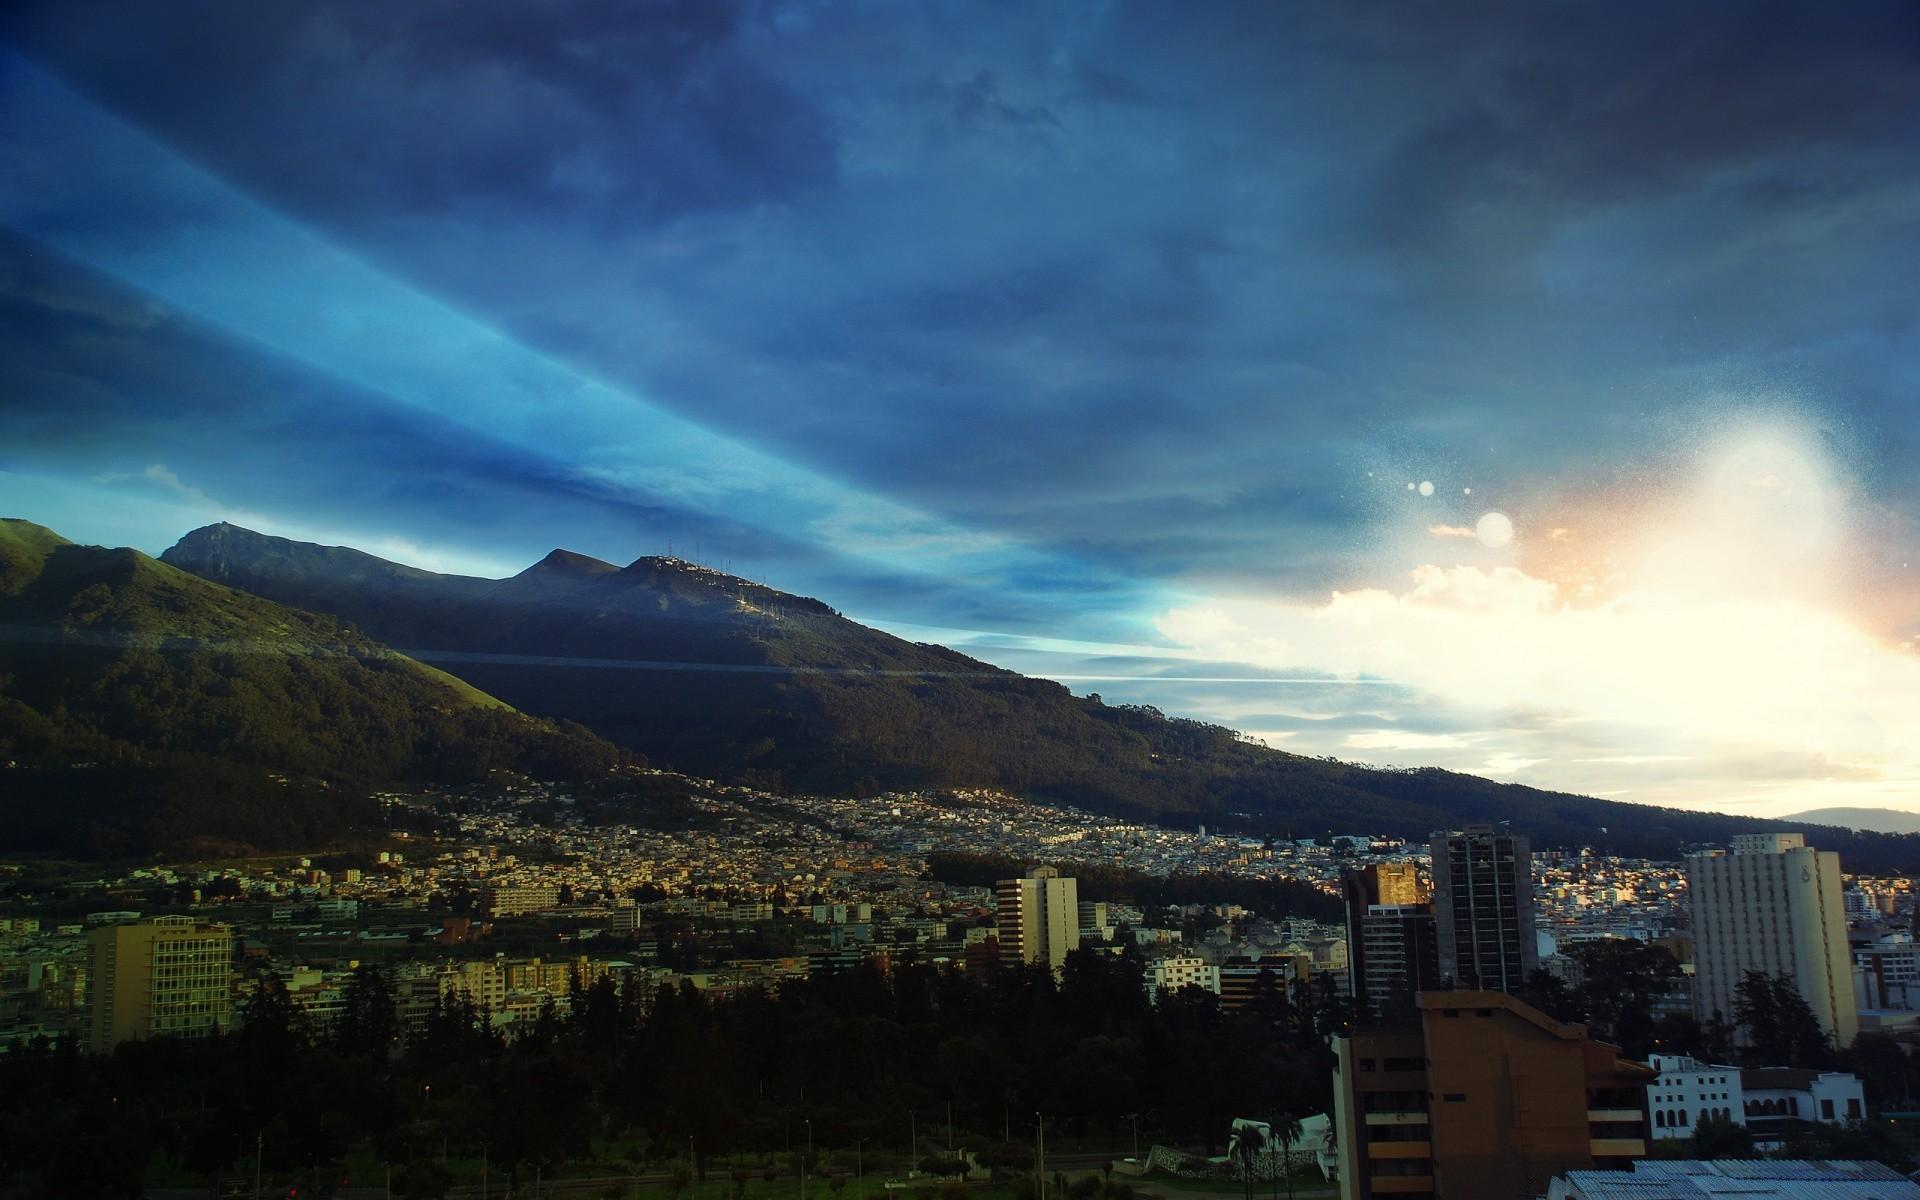 Other City Travel City Sky Sunset Mountain Landscape - Best Desktop Customization - HD Wallpaper